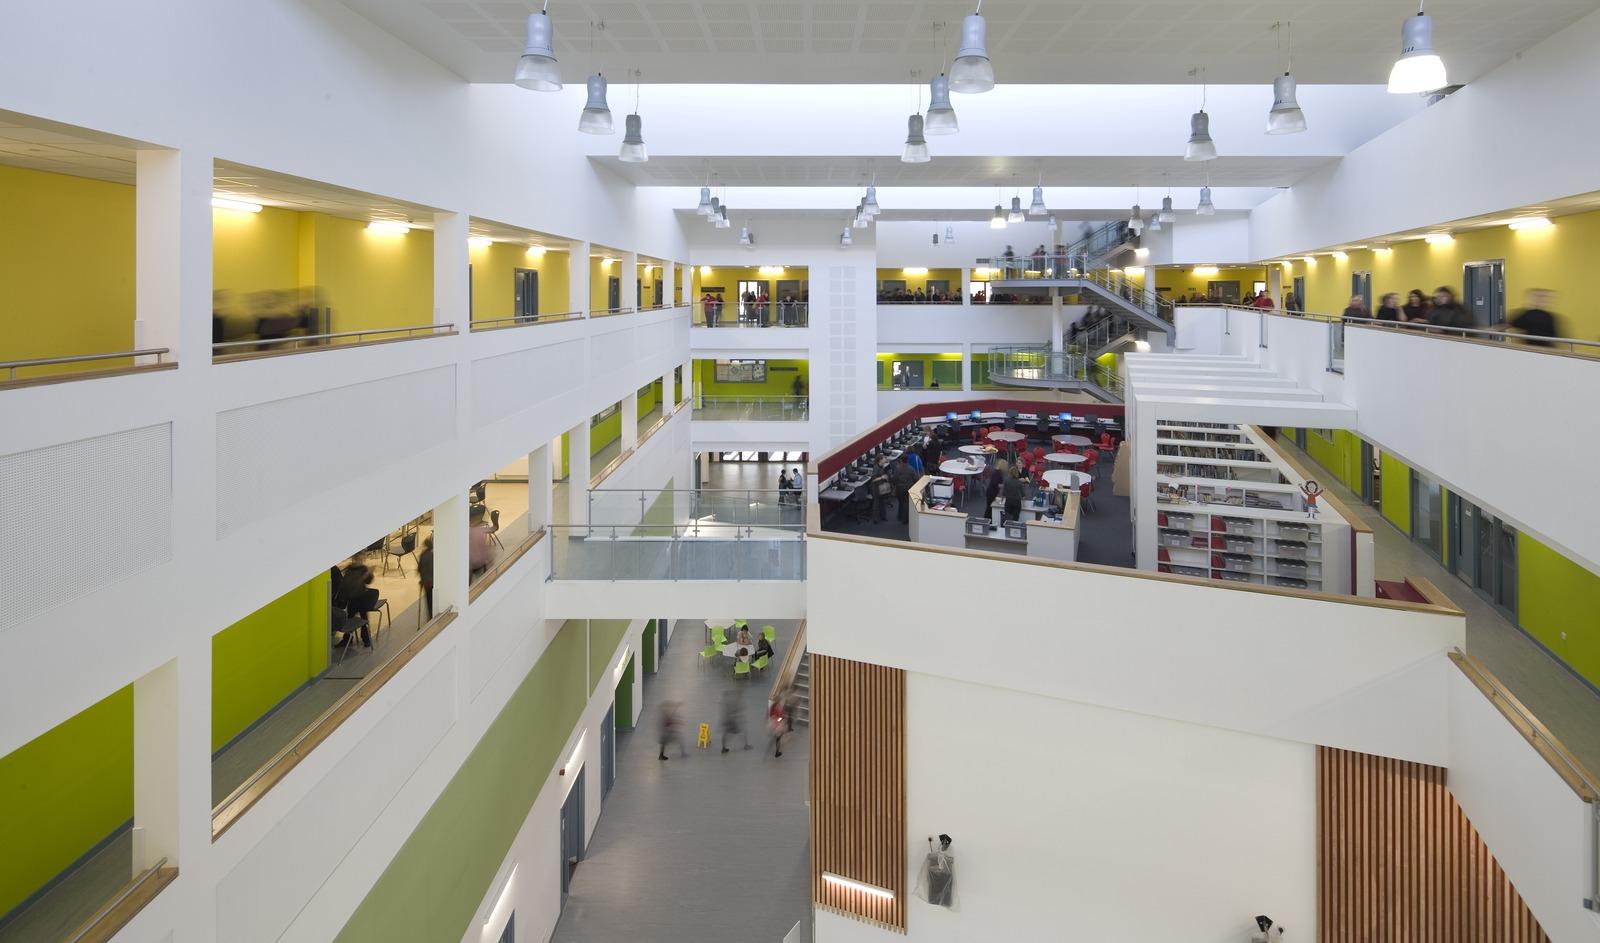 Stephen-Hill-Architects-Schools-Sheffield-03